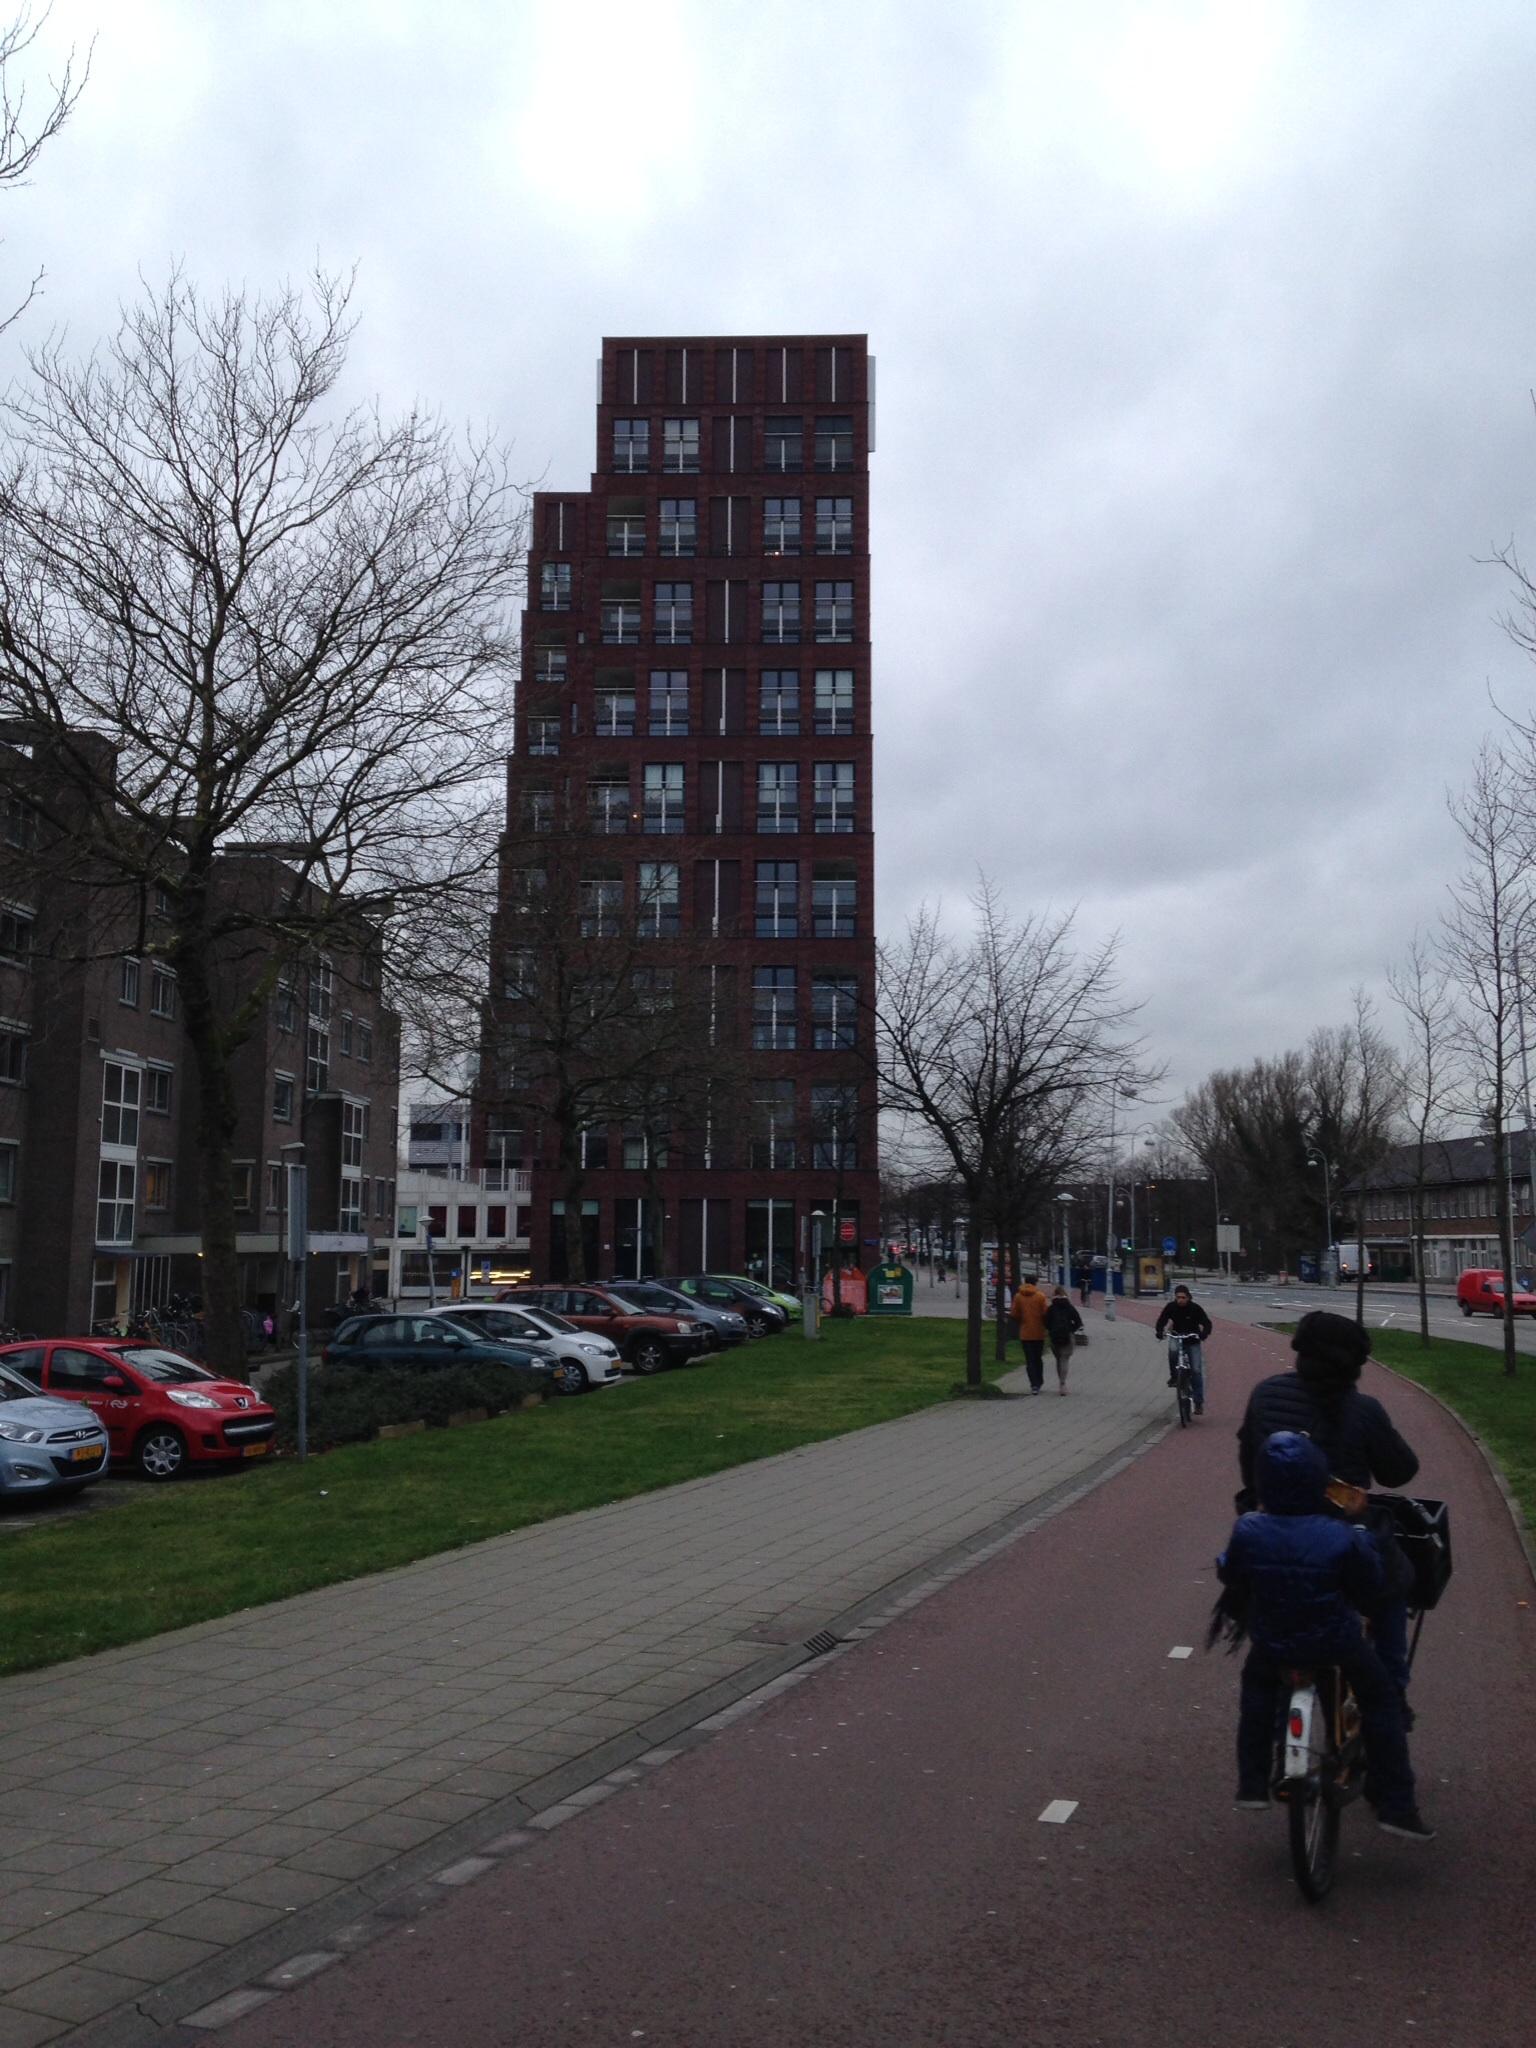 kopgevel de piramides Amsterdam